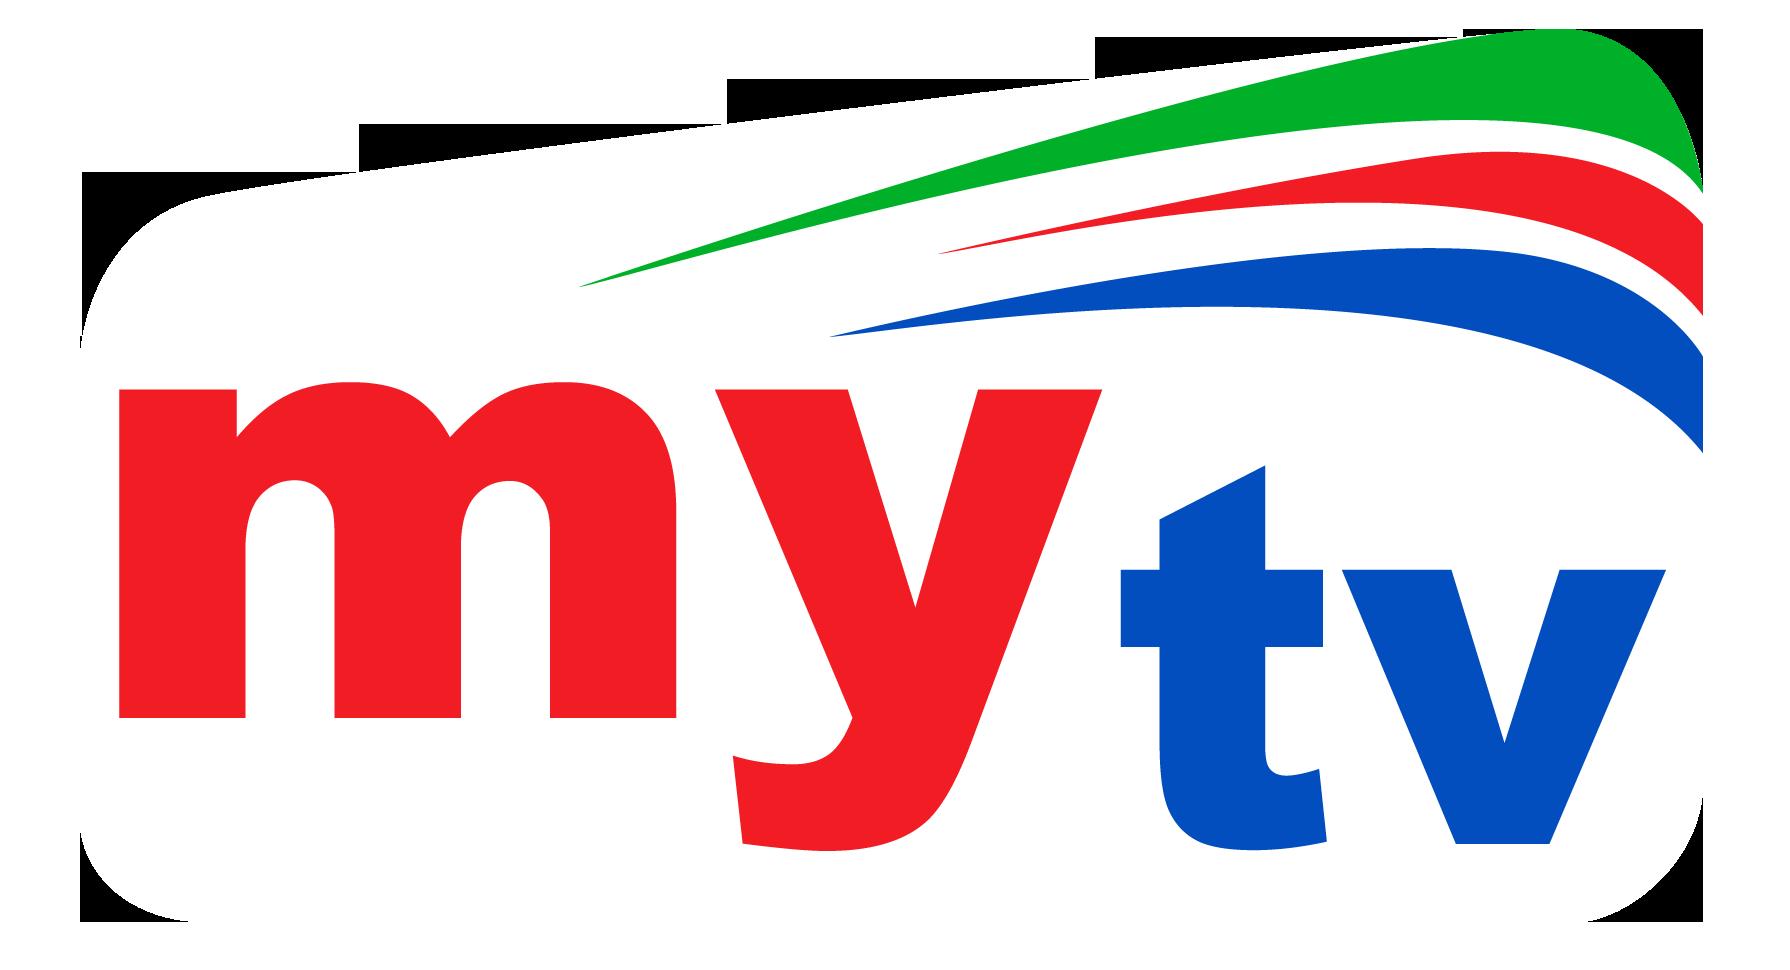 Boishakhi Tv Competitors, Revenue and Employees - Owler Company Profile